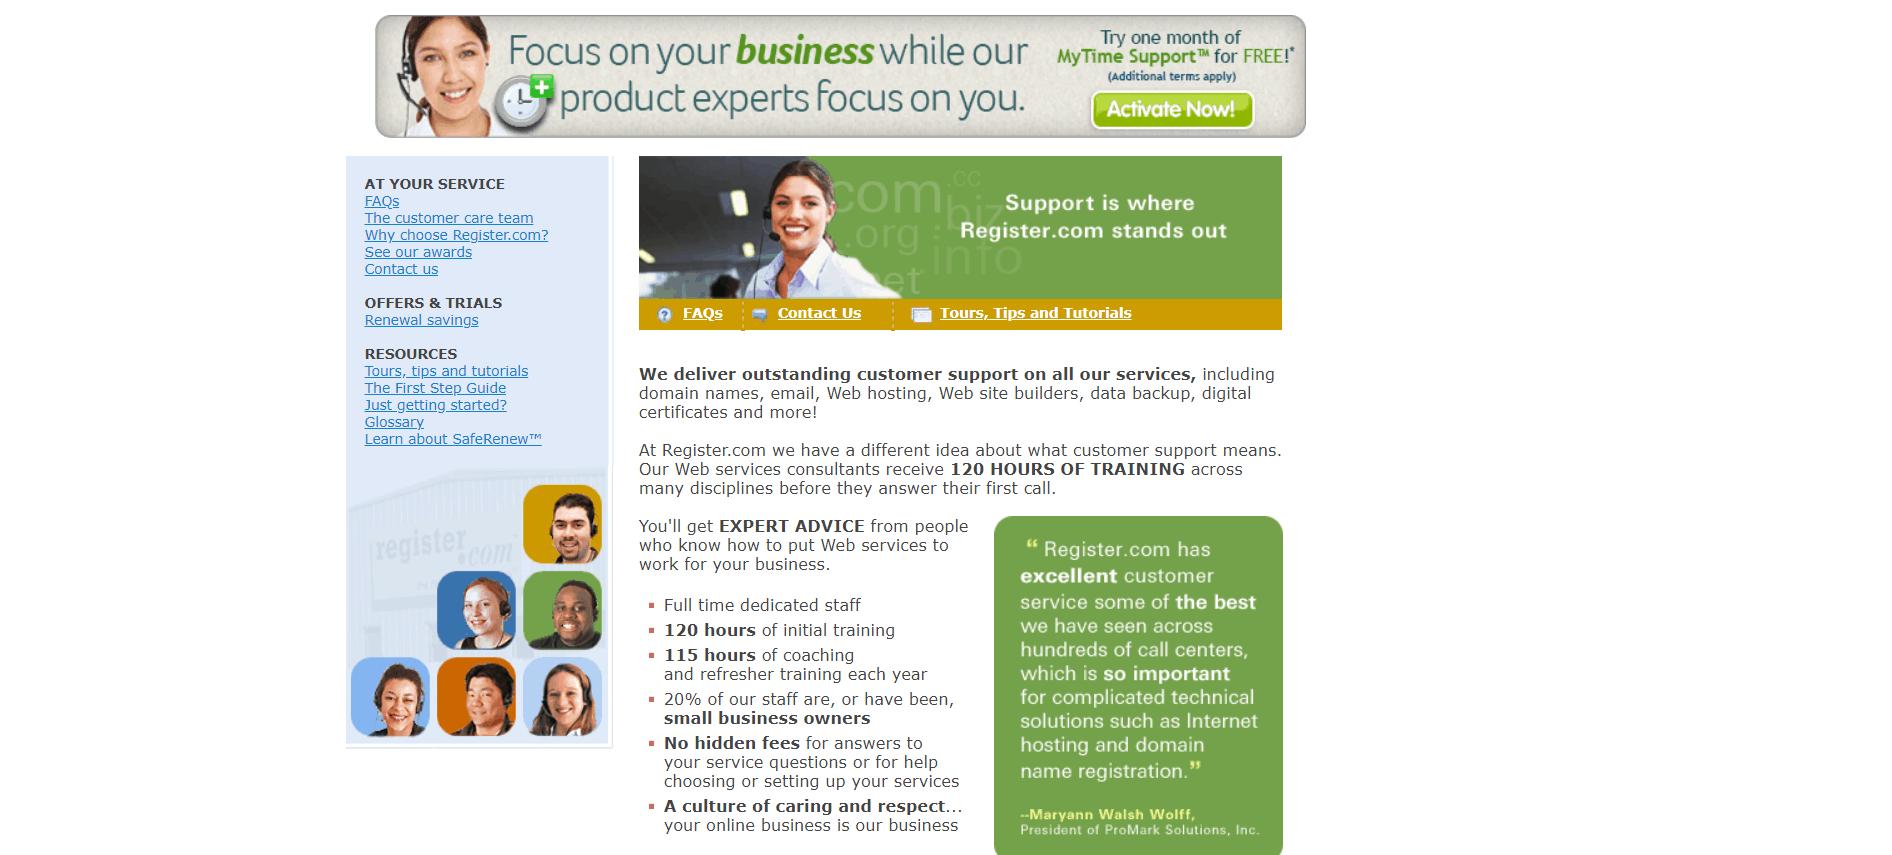 Register.com-support